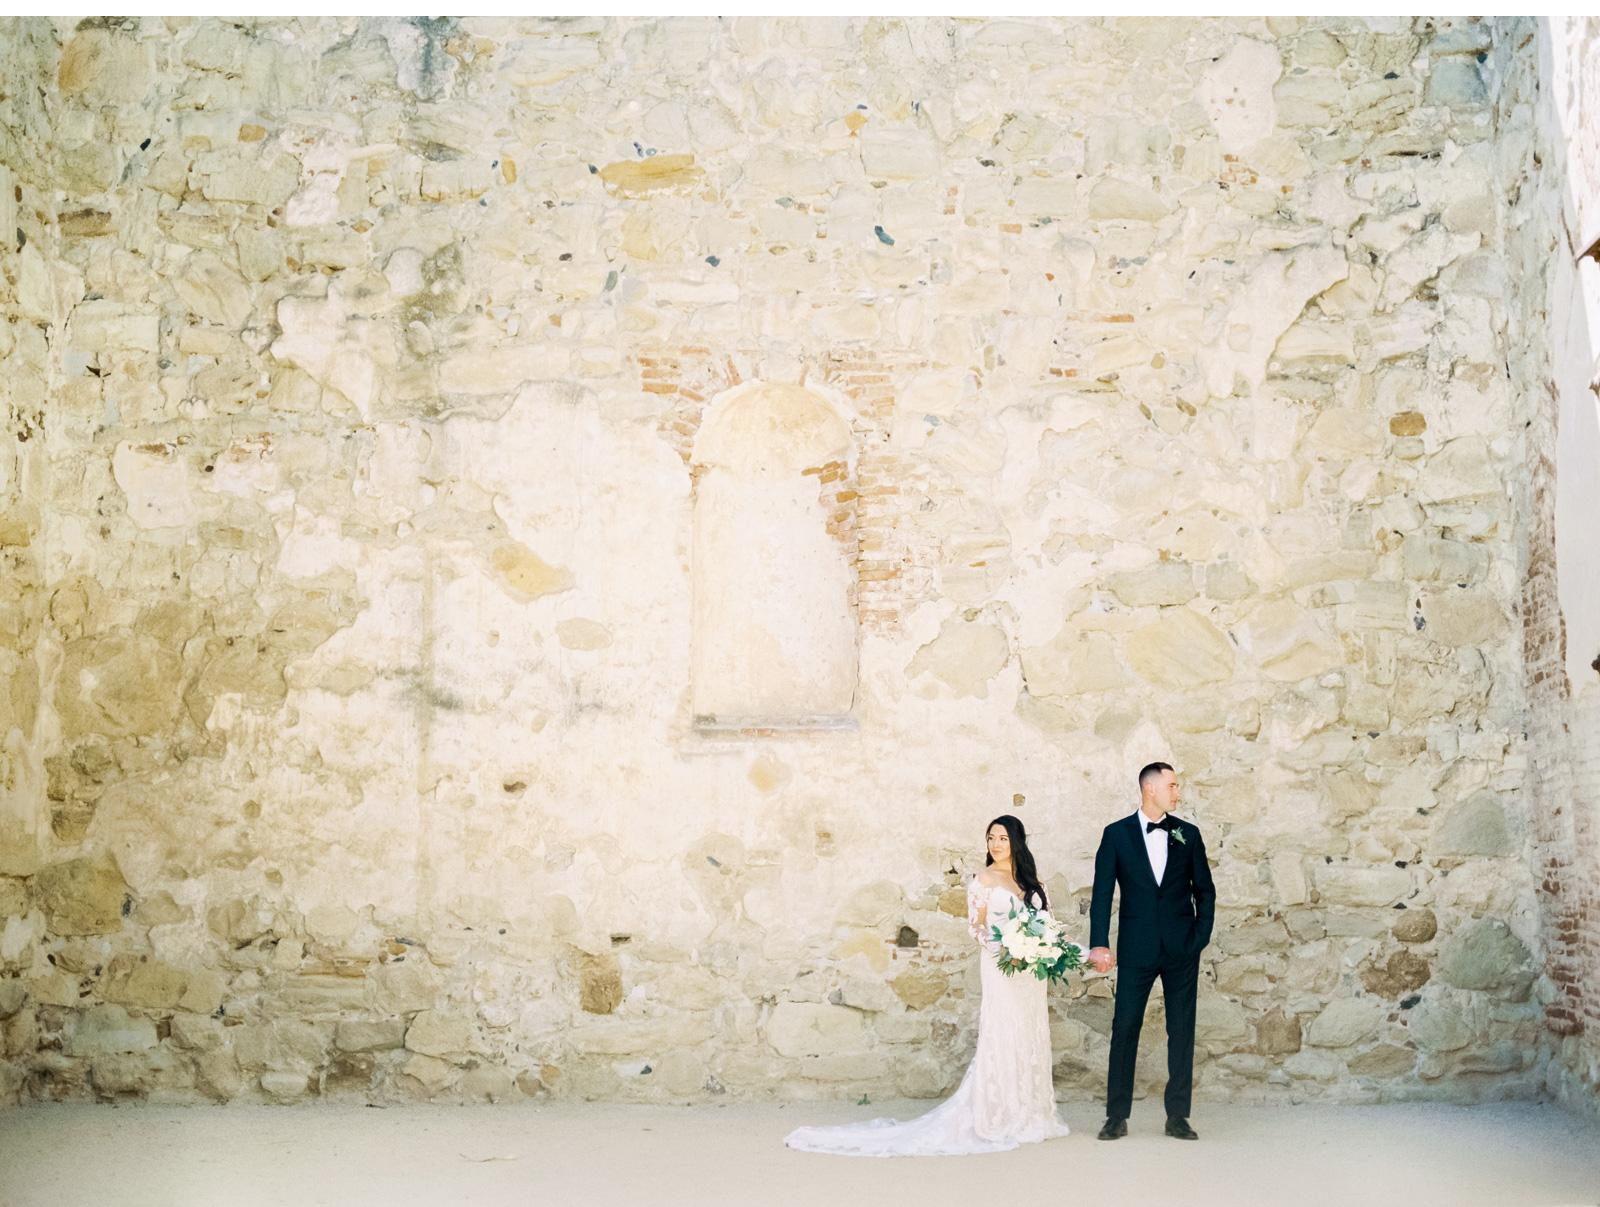 San-Diego-Weddings-Natalie-Schutt-Photography_07.jpg